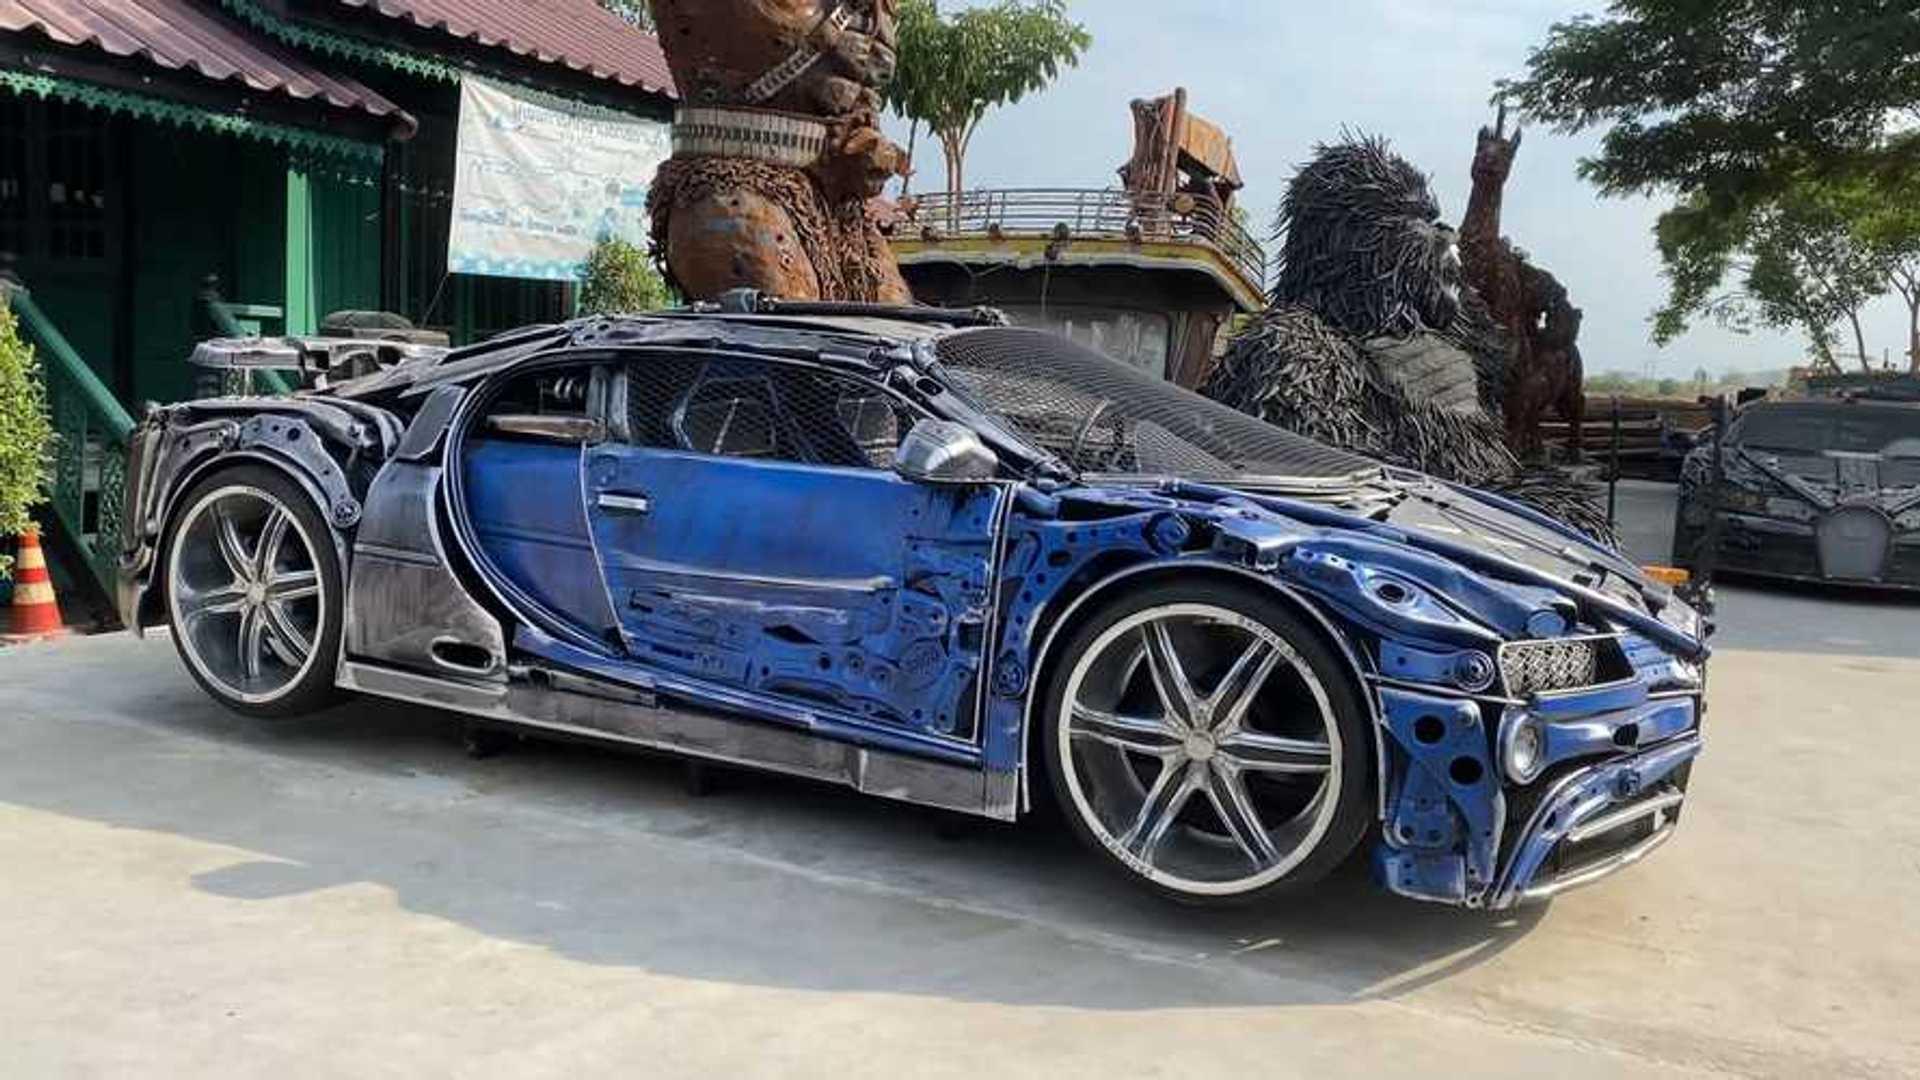 Реплика Bugatti Chiron из металлолома — автомобильный стимпанк